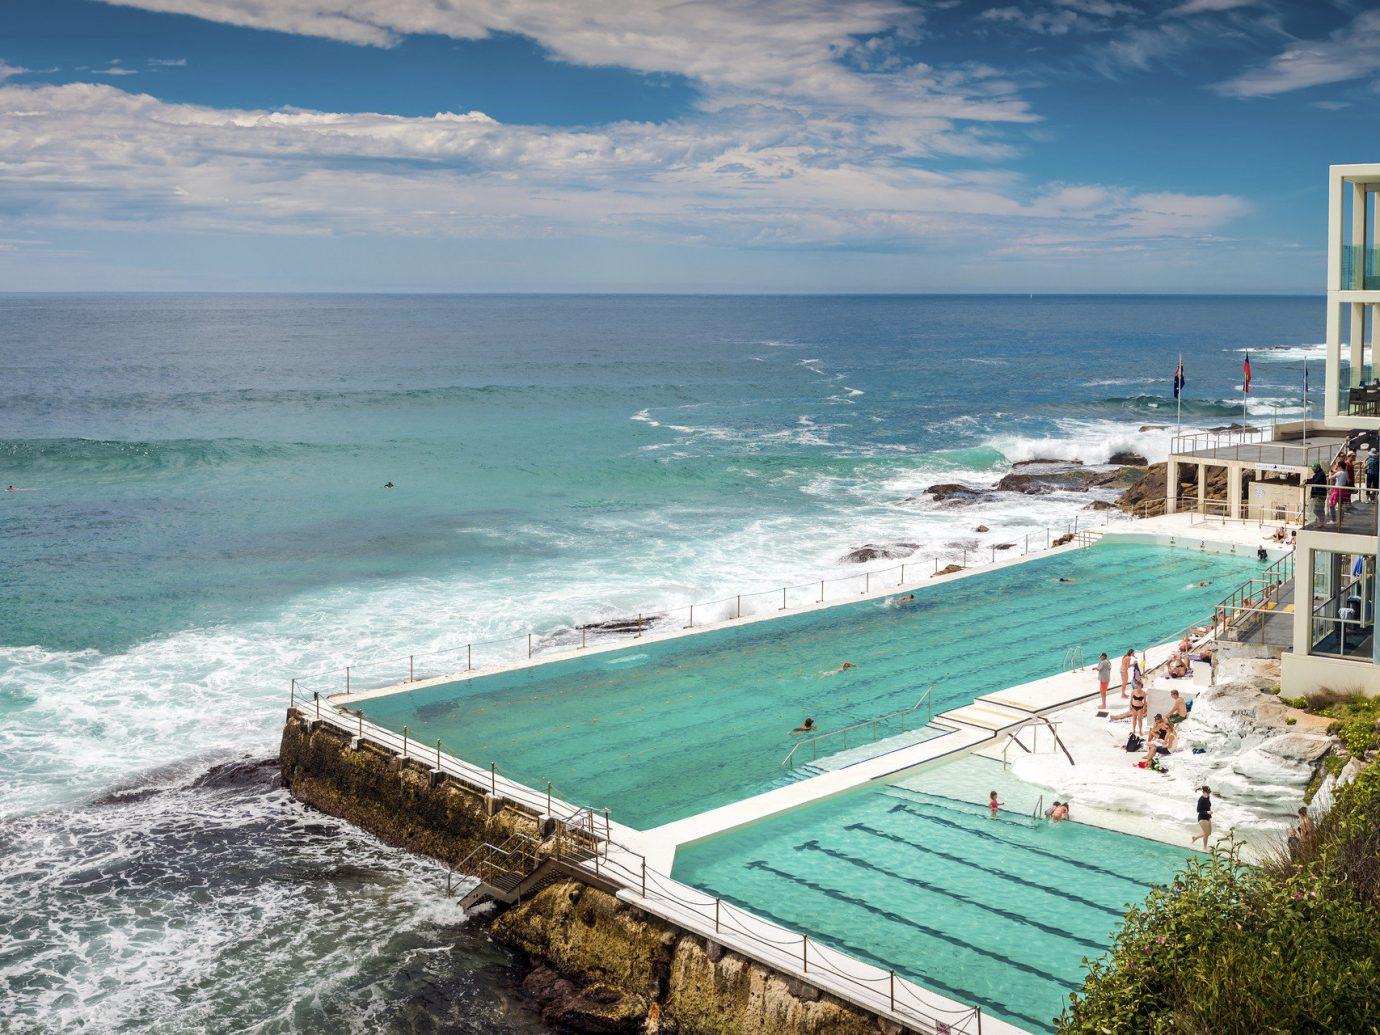 Hotels Offbeat Travel Tips Trip Ideas water sky outdoor Sea Ocean shore Beach body of water Coast vacation caribbean bay cape Resort cove dock sandy